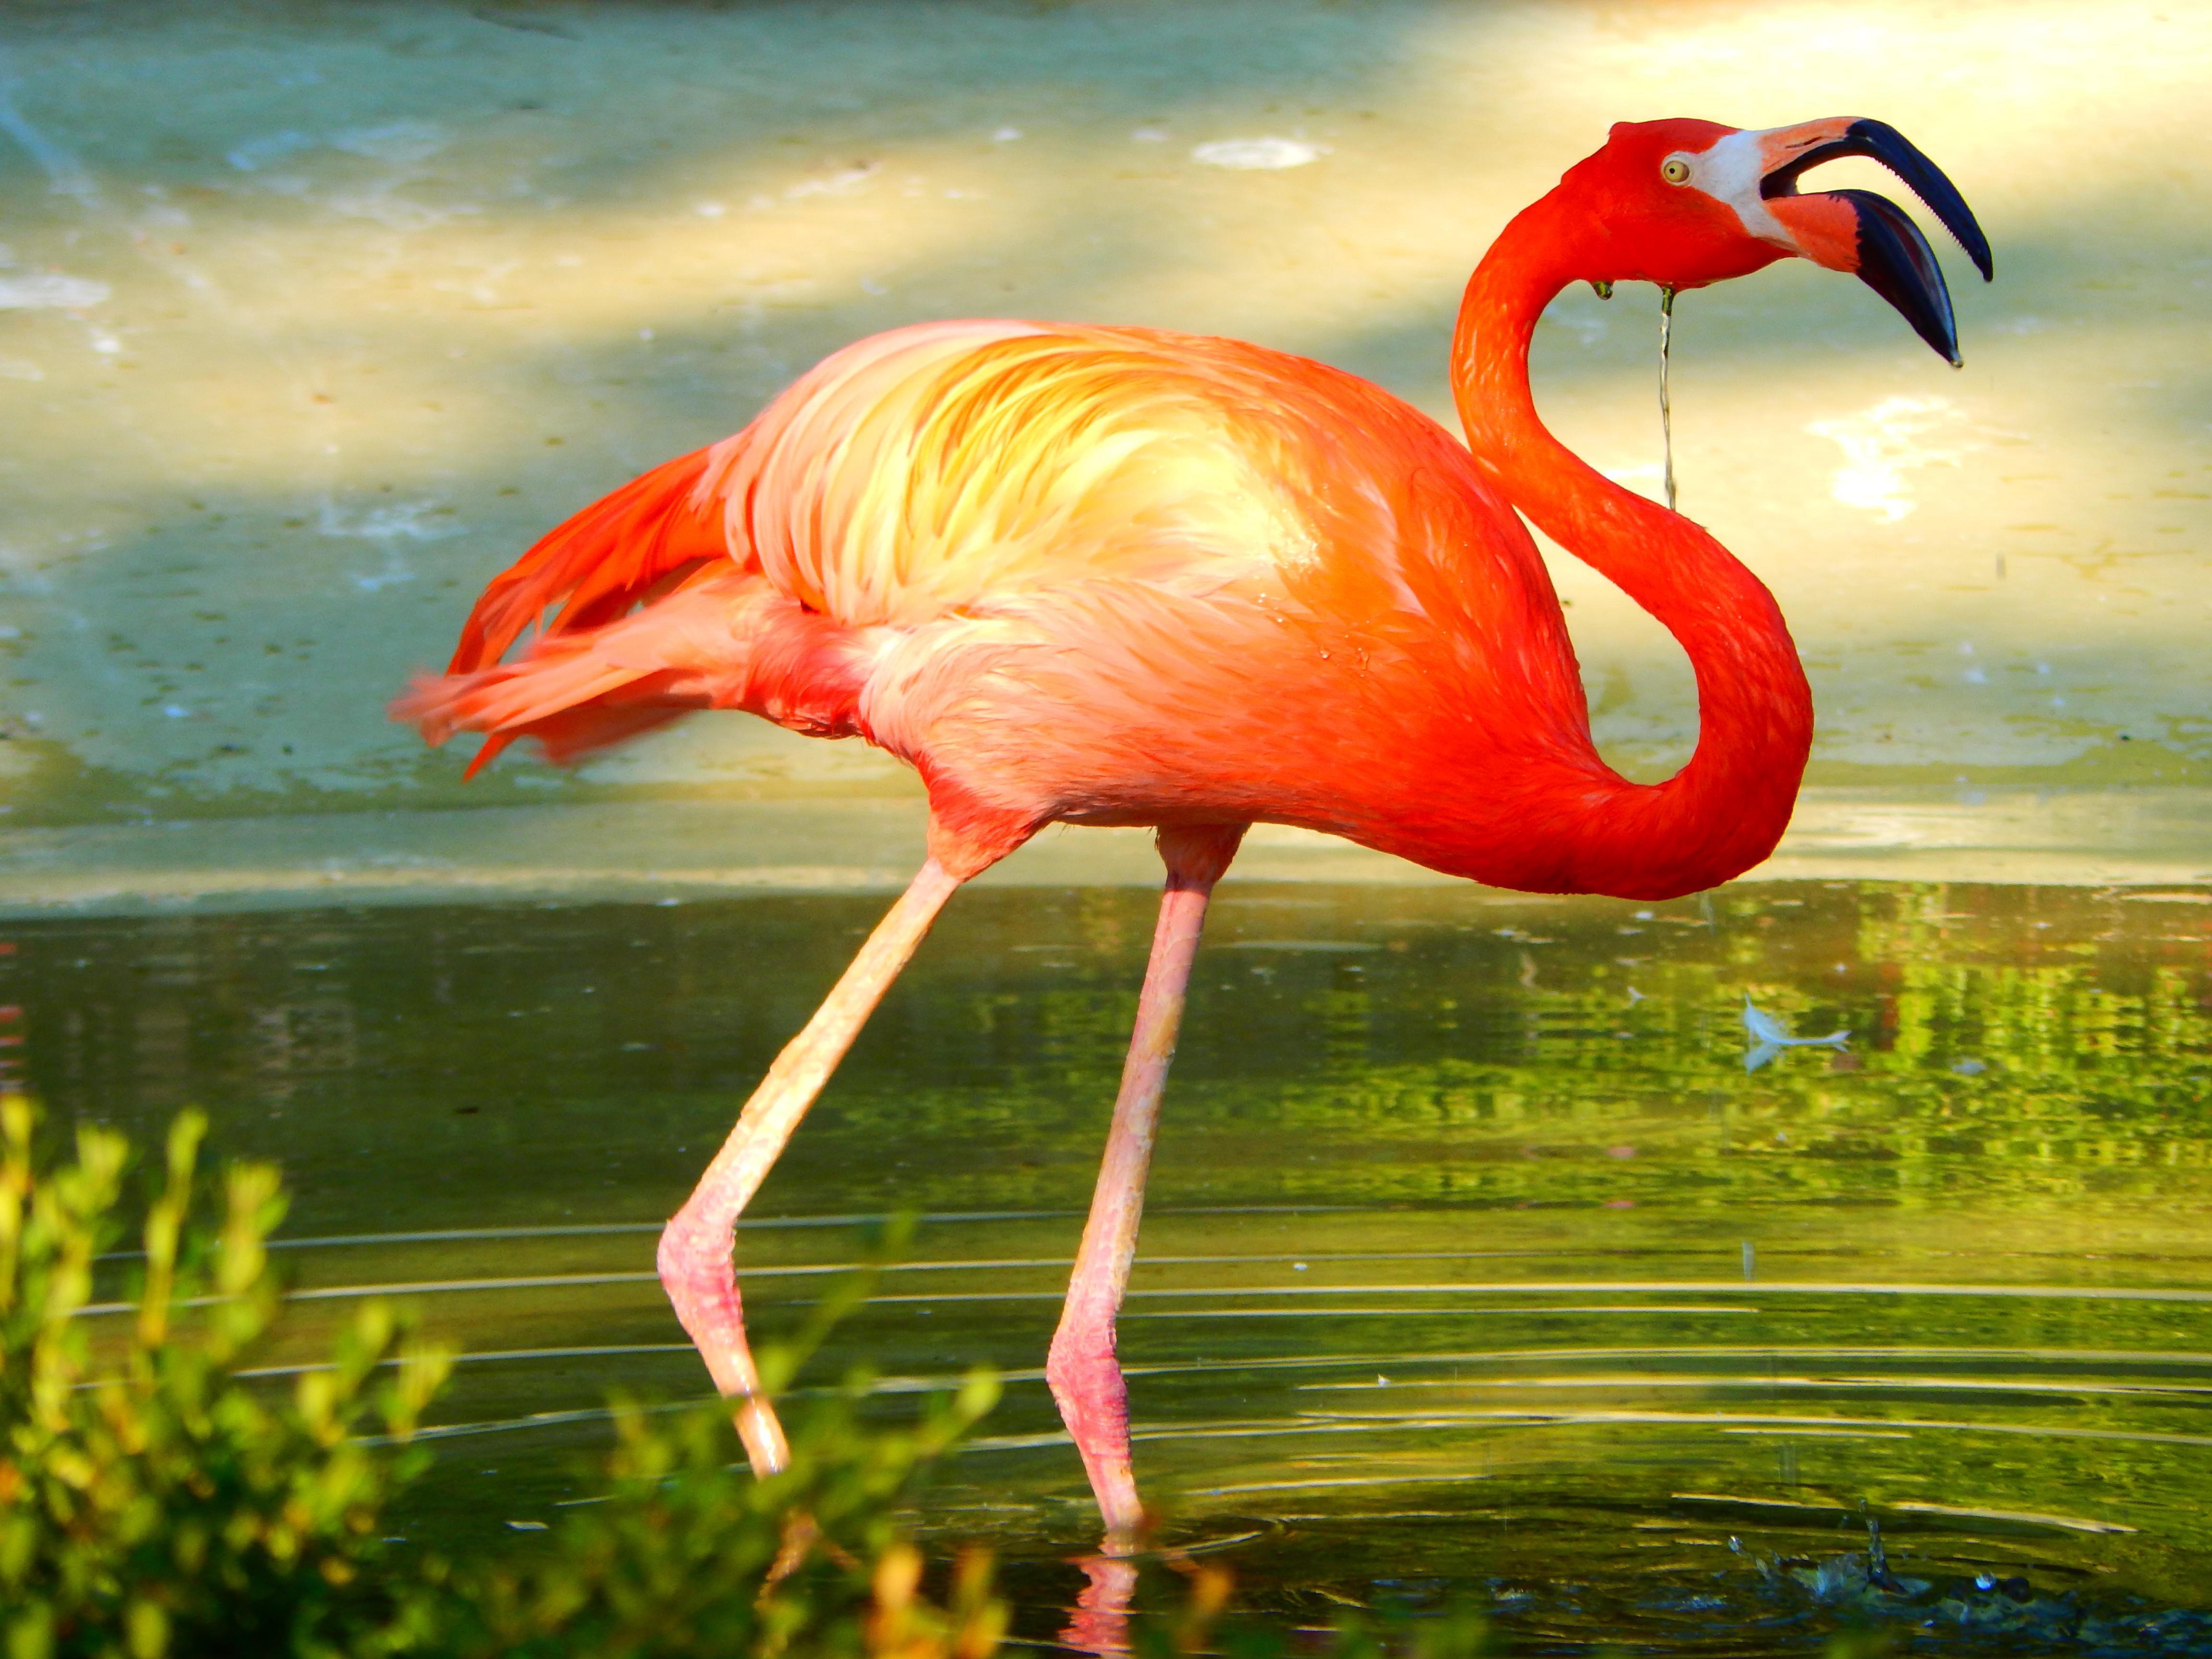 lesser-flamingo_deepan-dutta-chowdhury-lmb